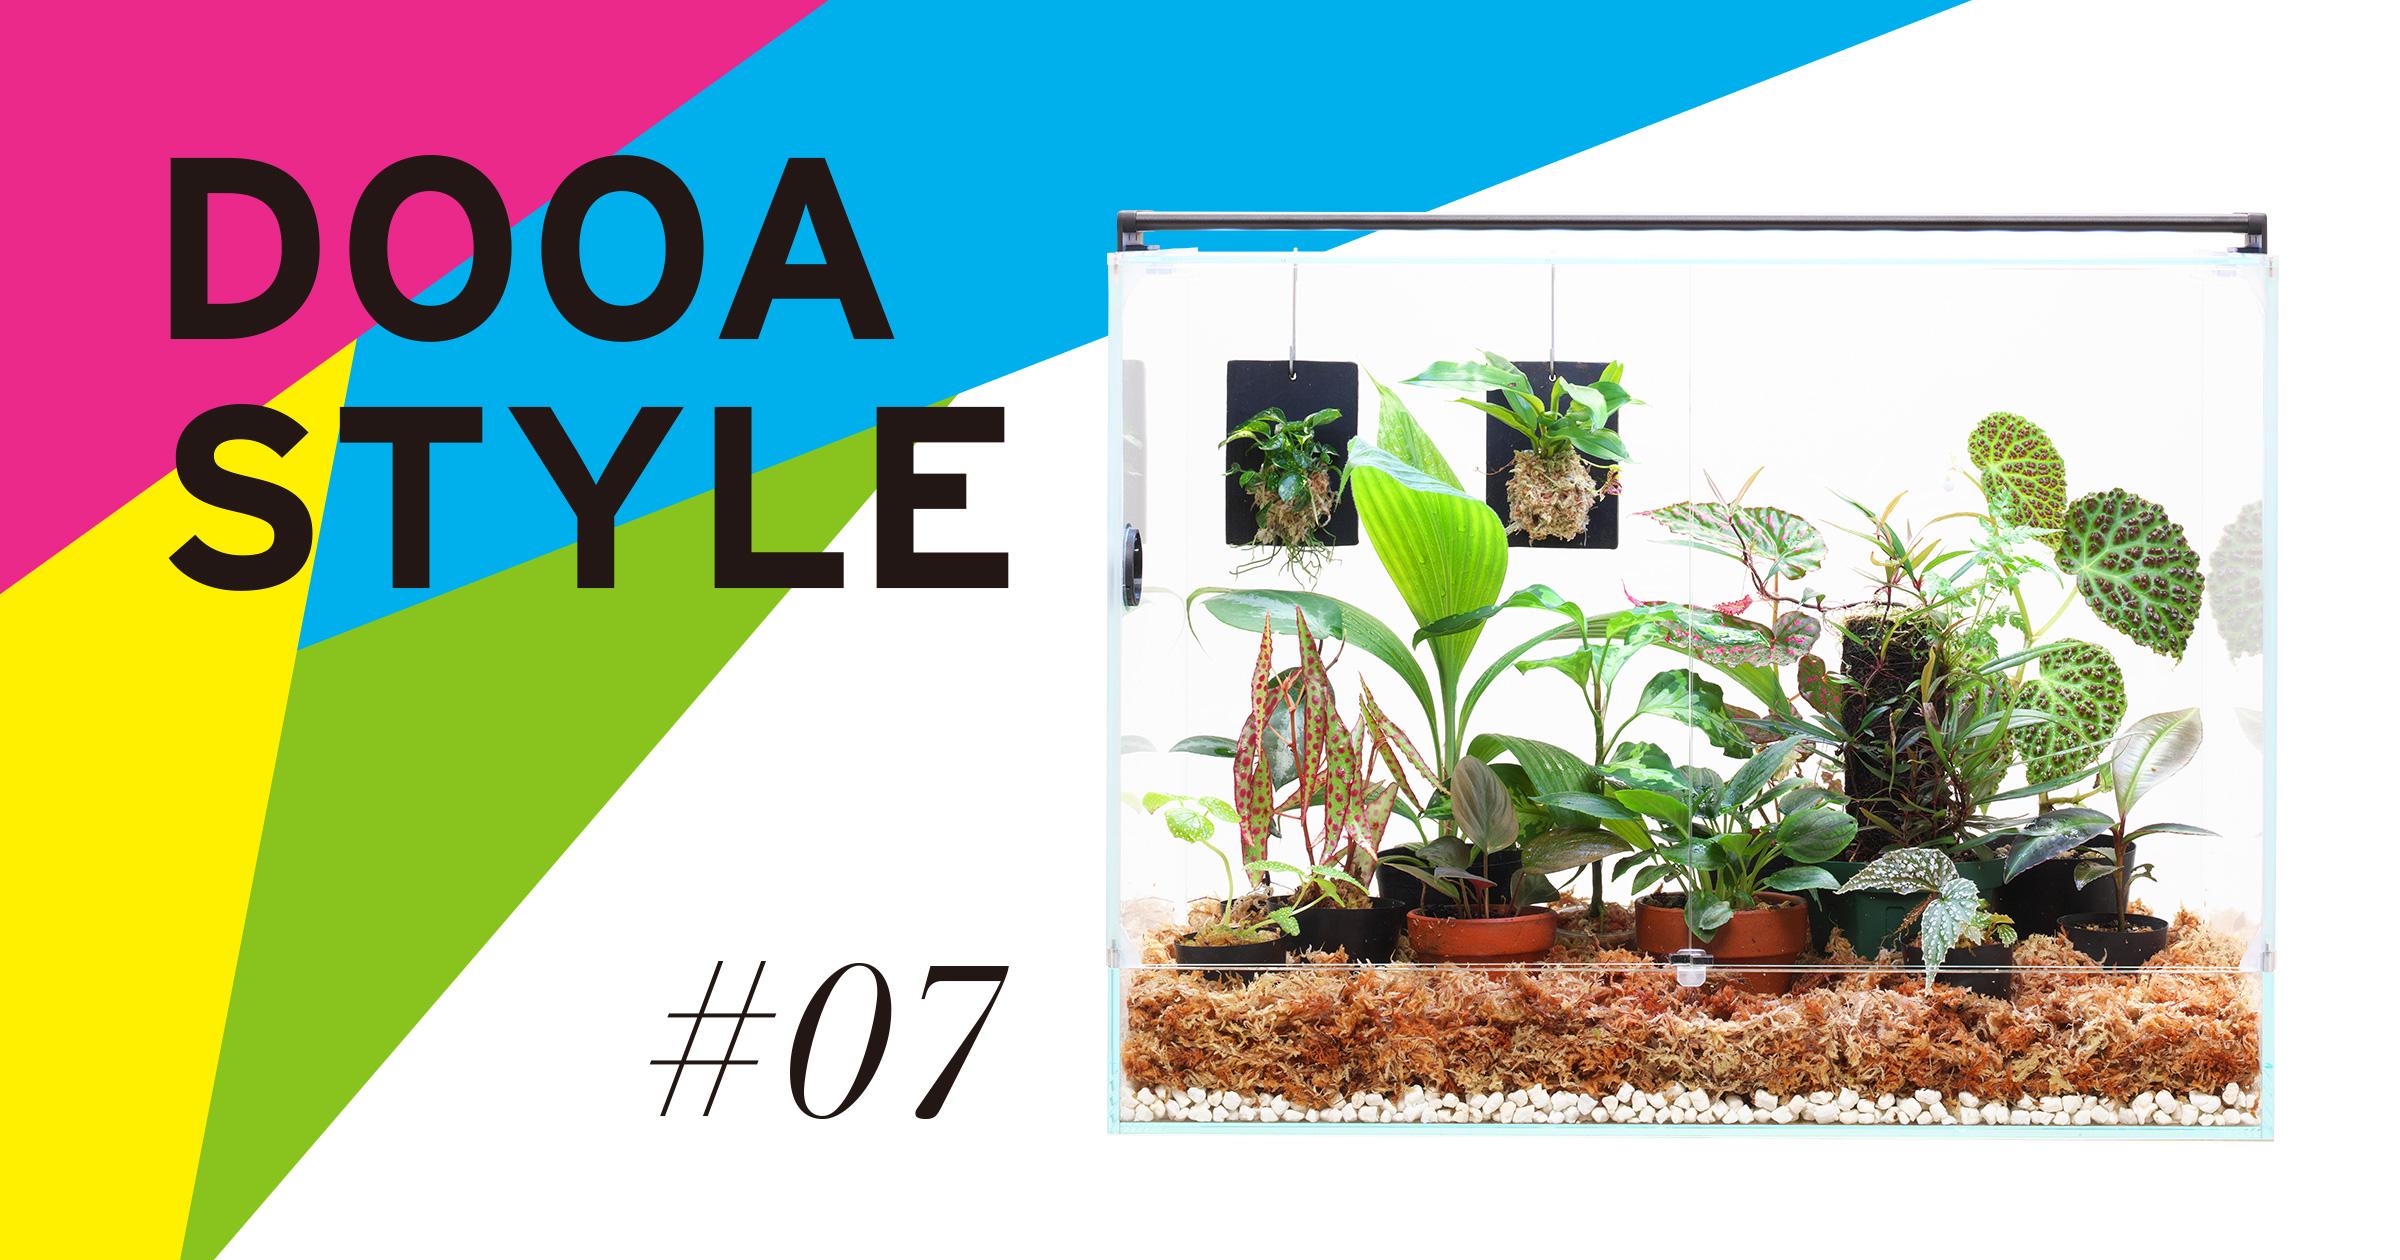 DOOA STYLE #7 'A living room for Jungle Plants'